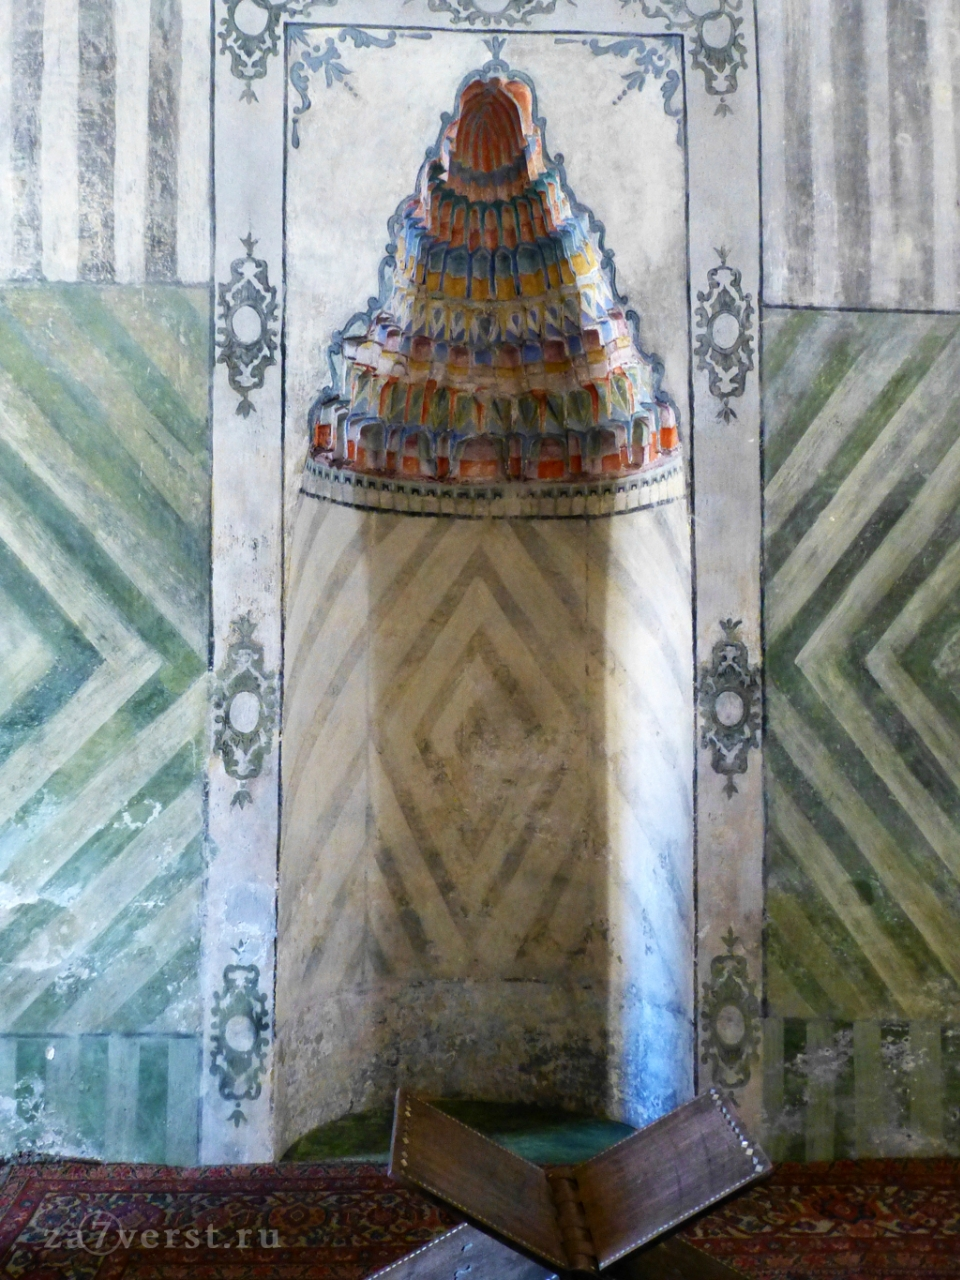 Бахчисарайский дворец, интерьер